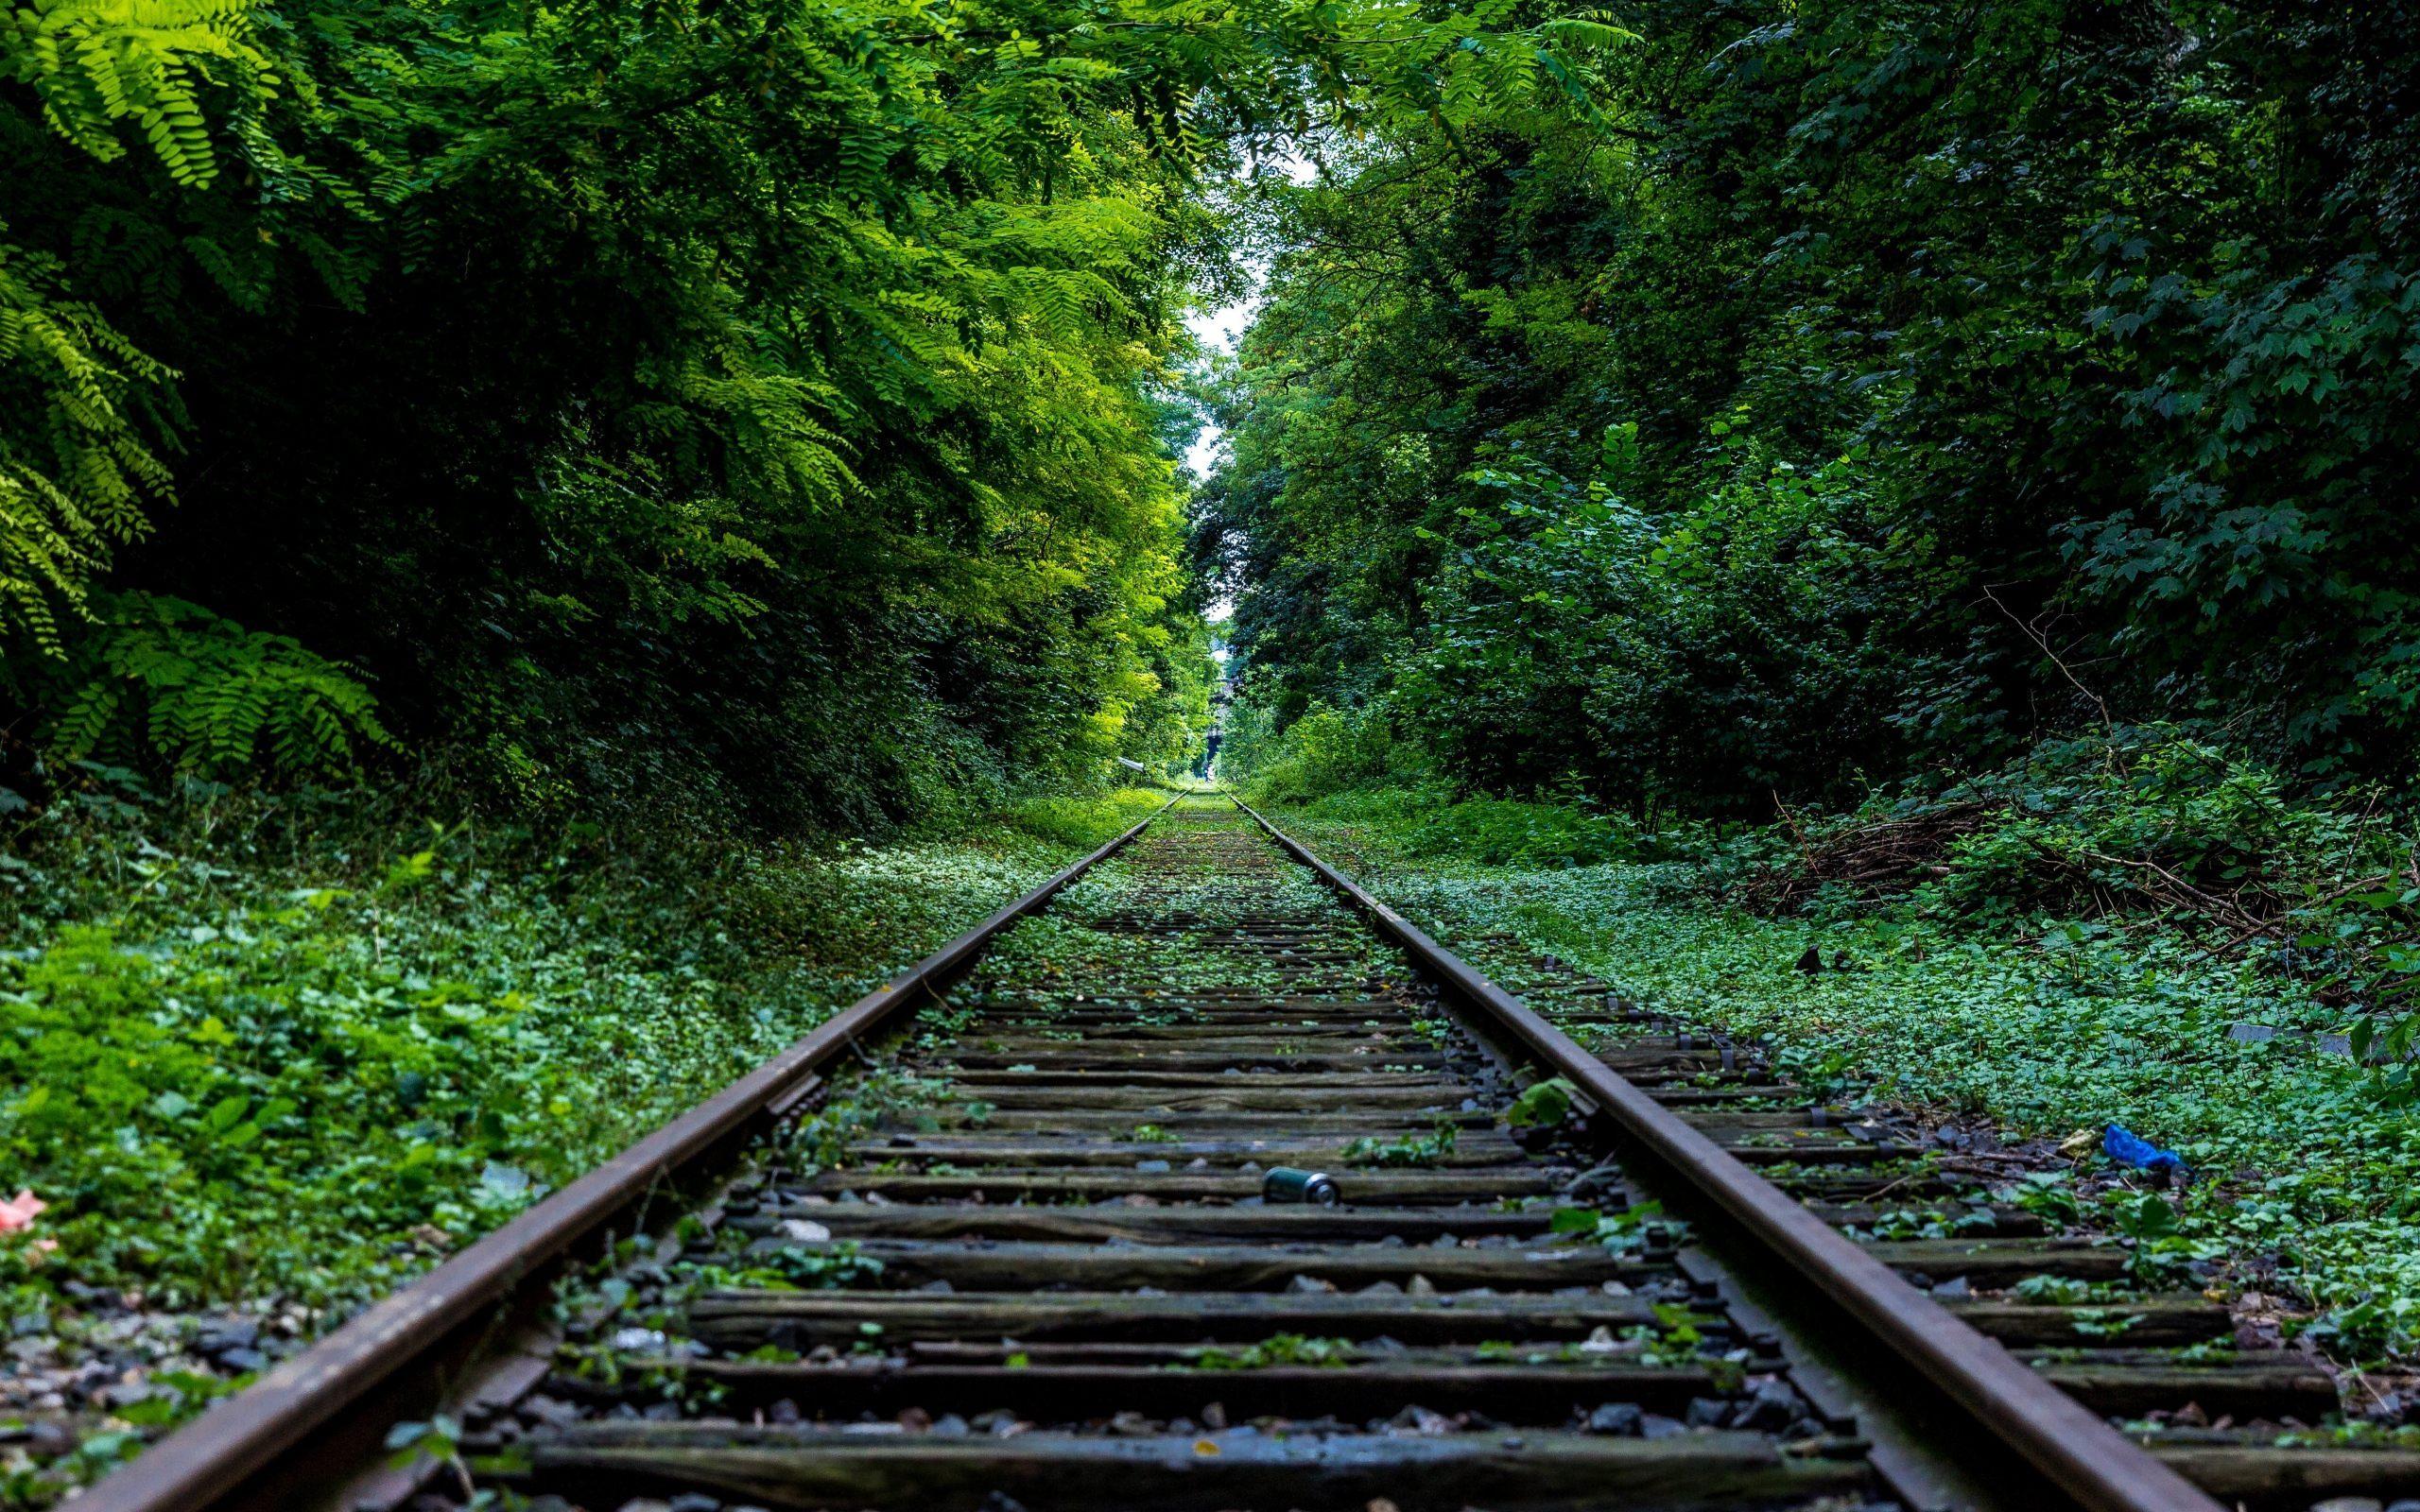 Railtrack in Forest Scenery Wallpaper.